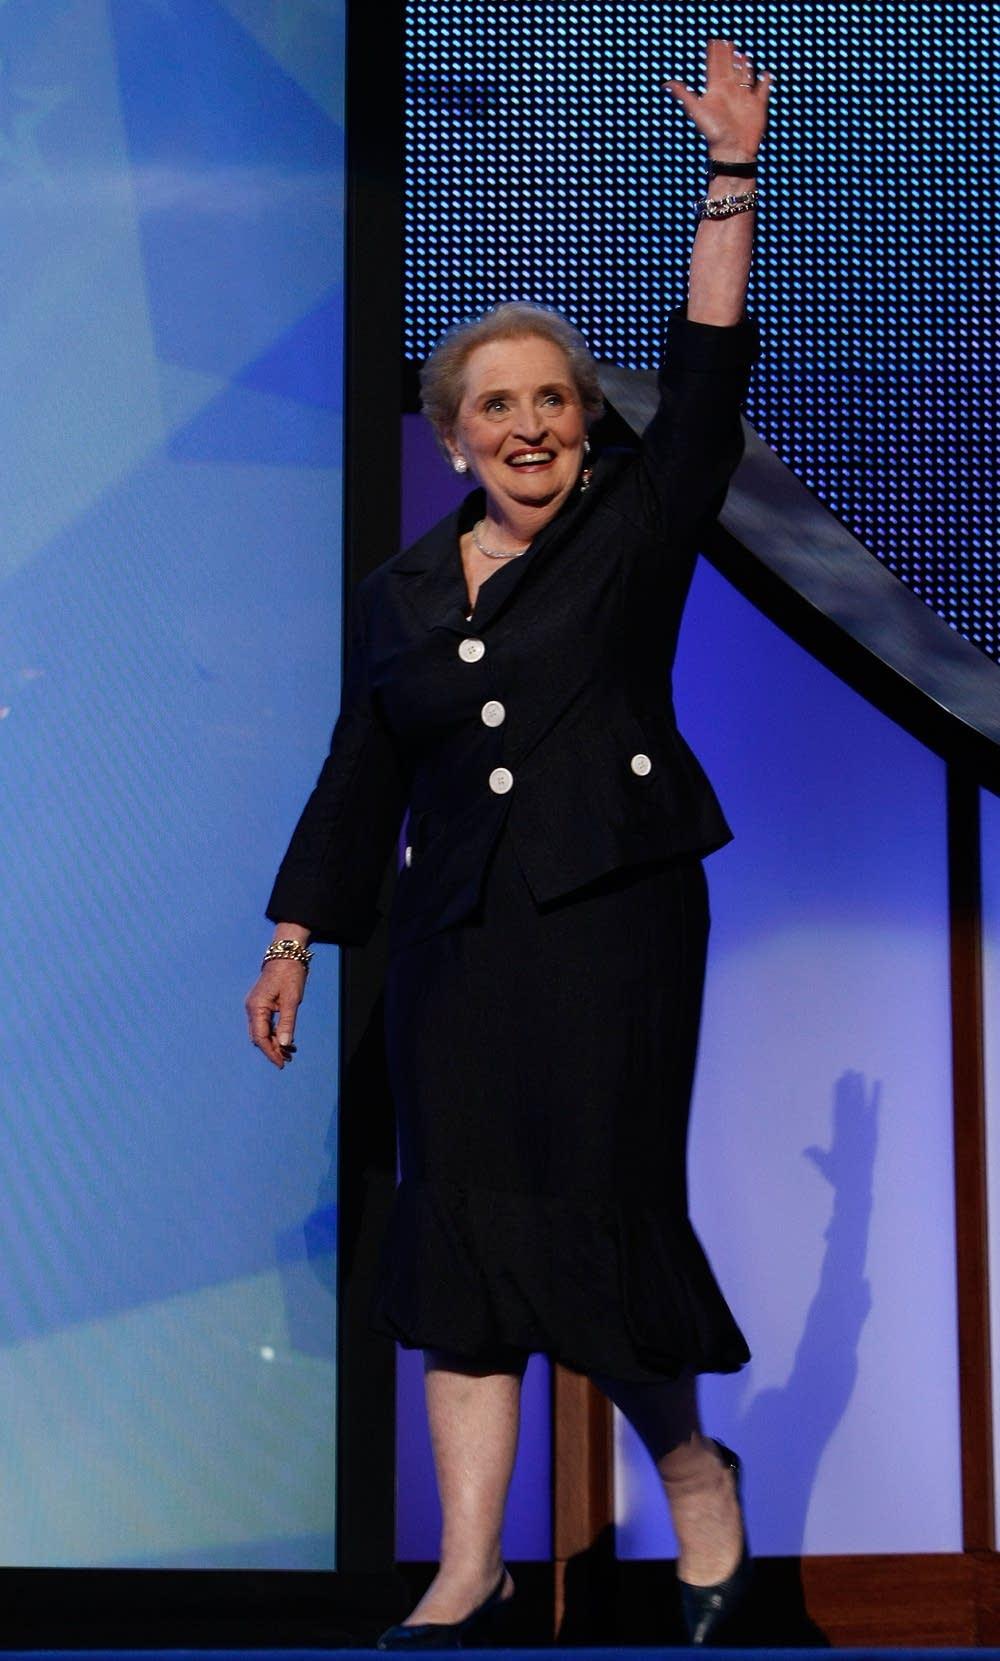 Medeleine Albright walks on stage during the DNC